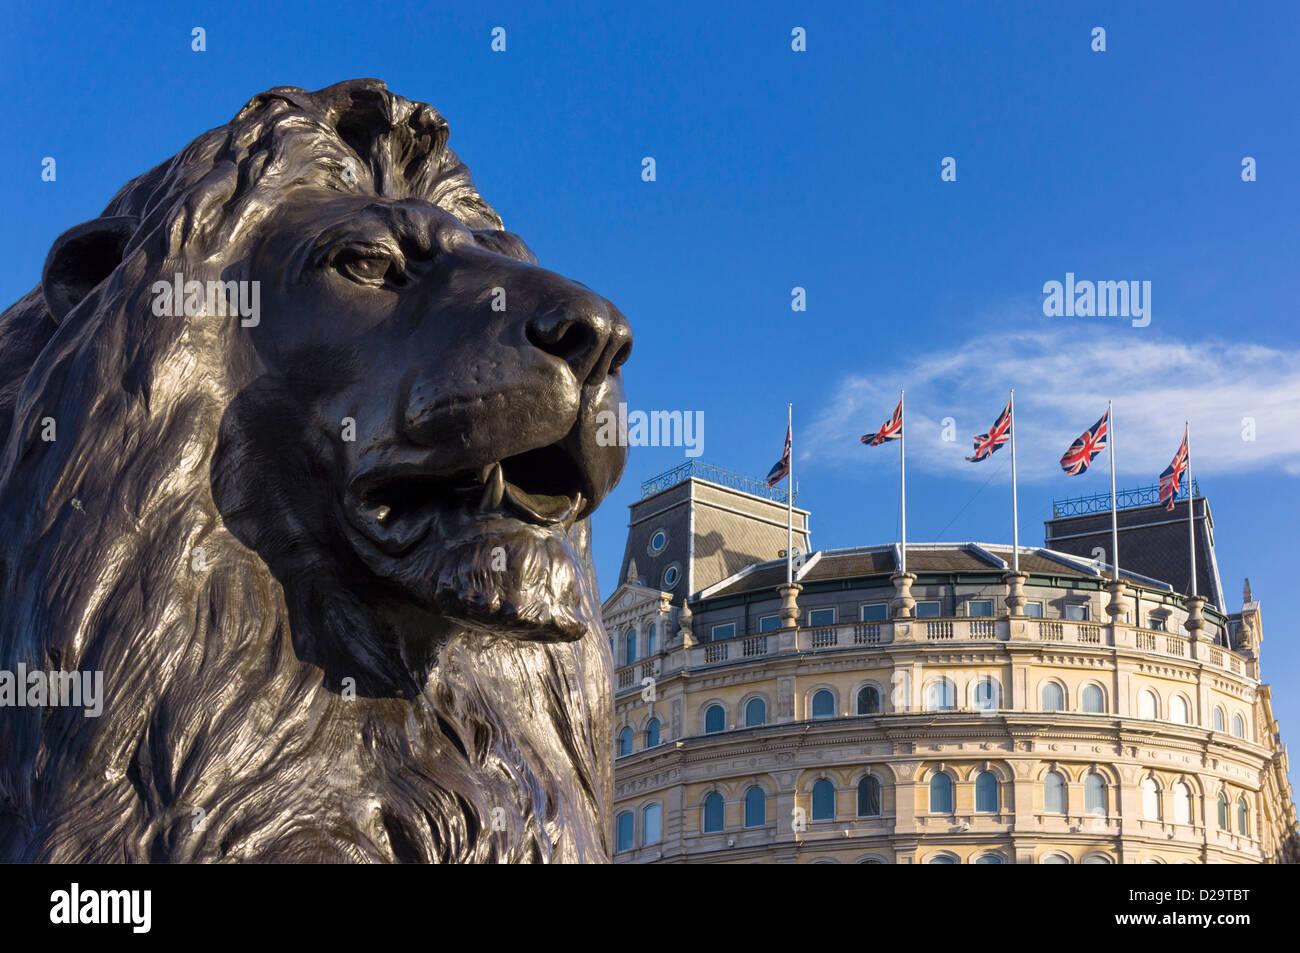 Lion in Trafalgar Square, London, England, UK - with Union Jack flags behind - Stock Image